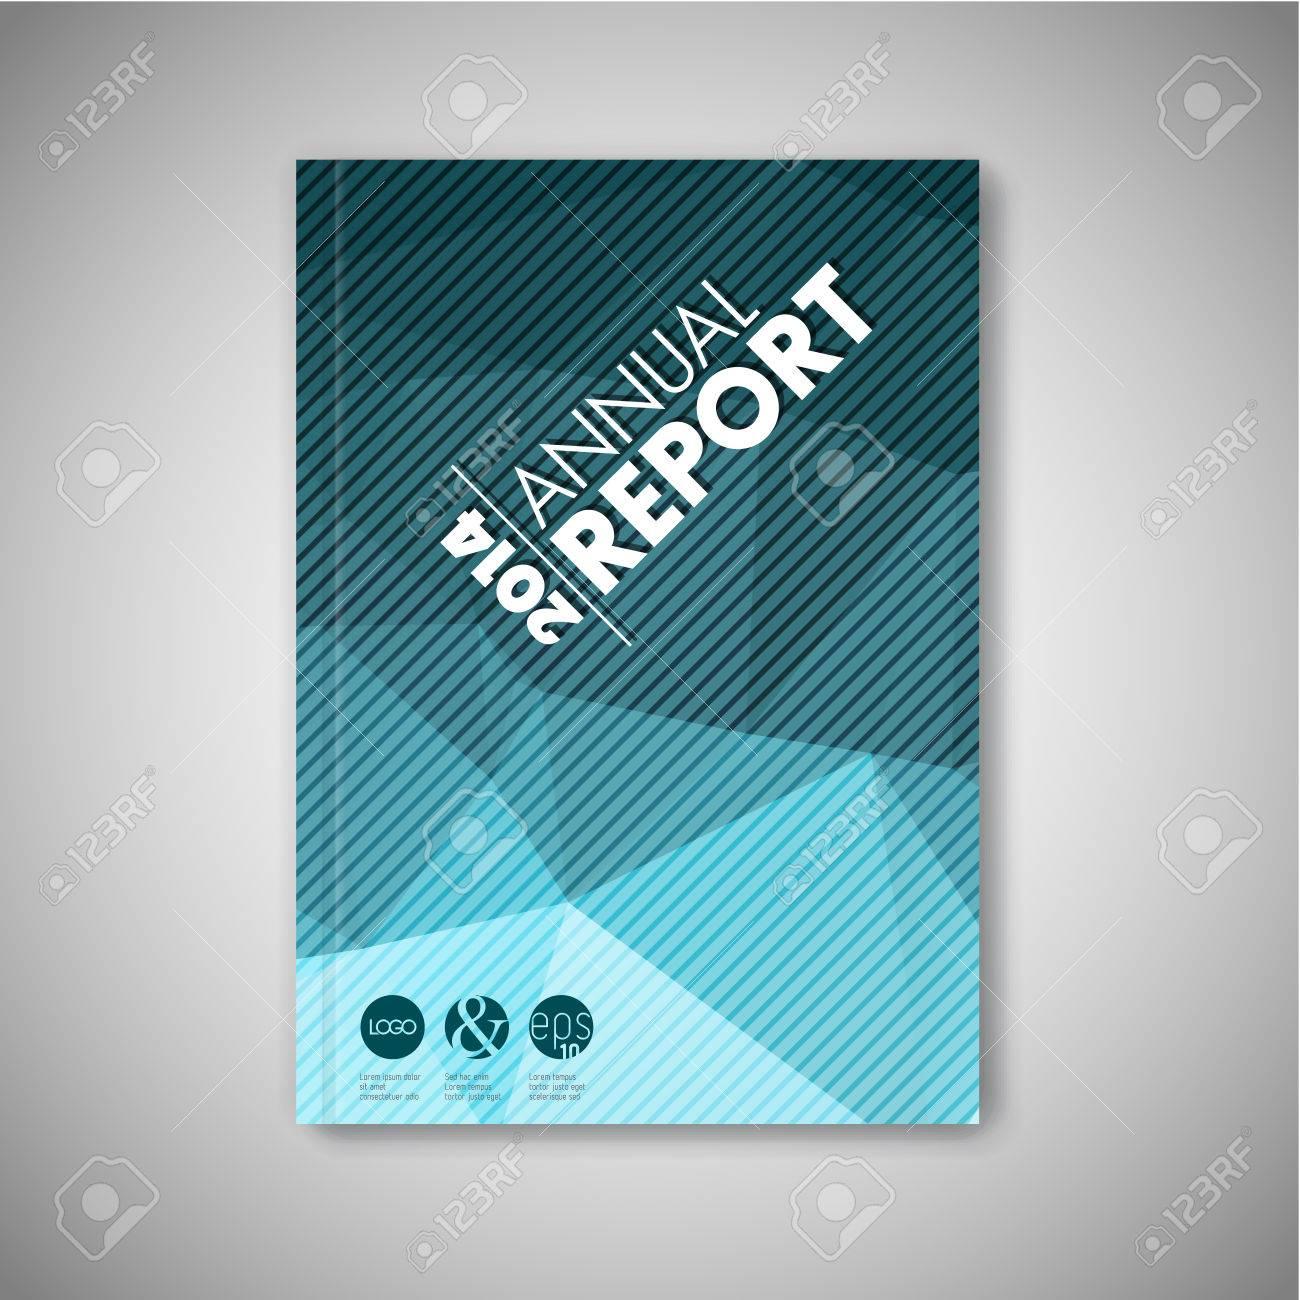 Modern Vector abstract brochure / book / flyer design template - blue polygon version - 41662734